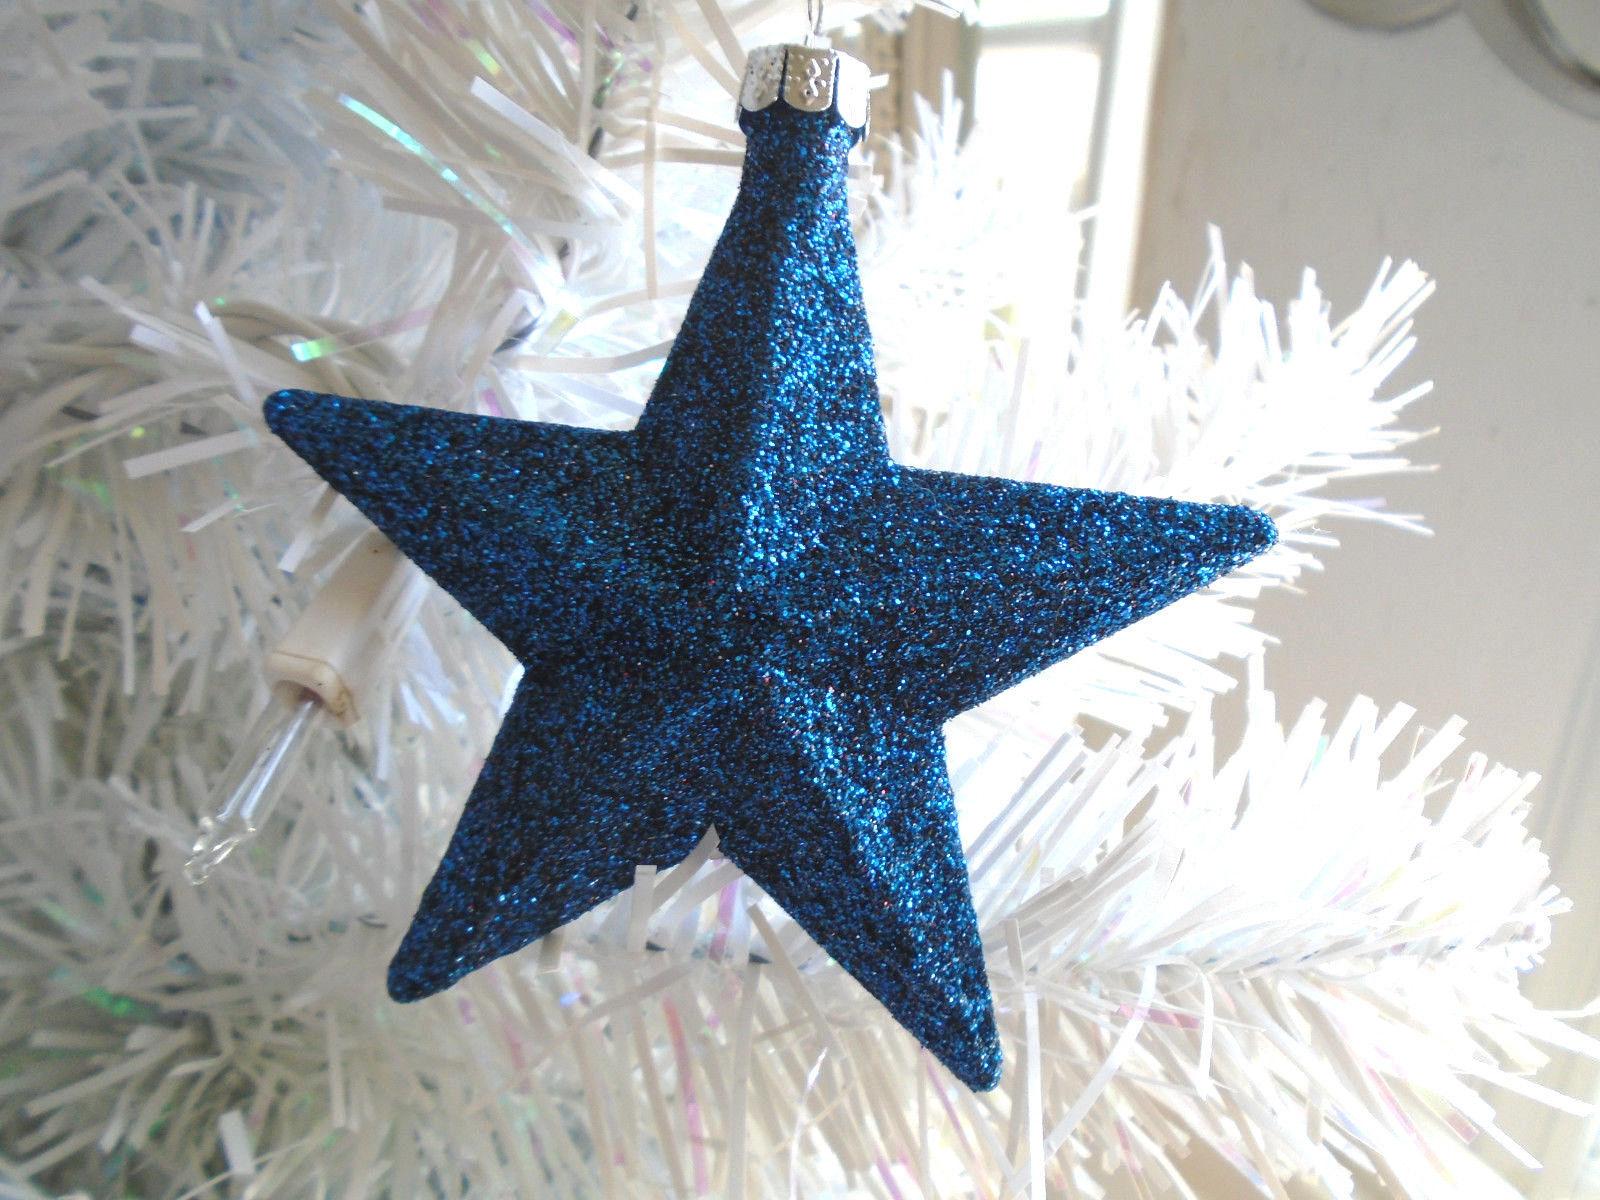 Blue Navy Glitter Star Ornaments Tree Patriotic Fourth Of July